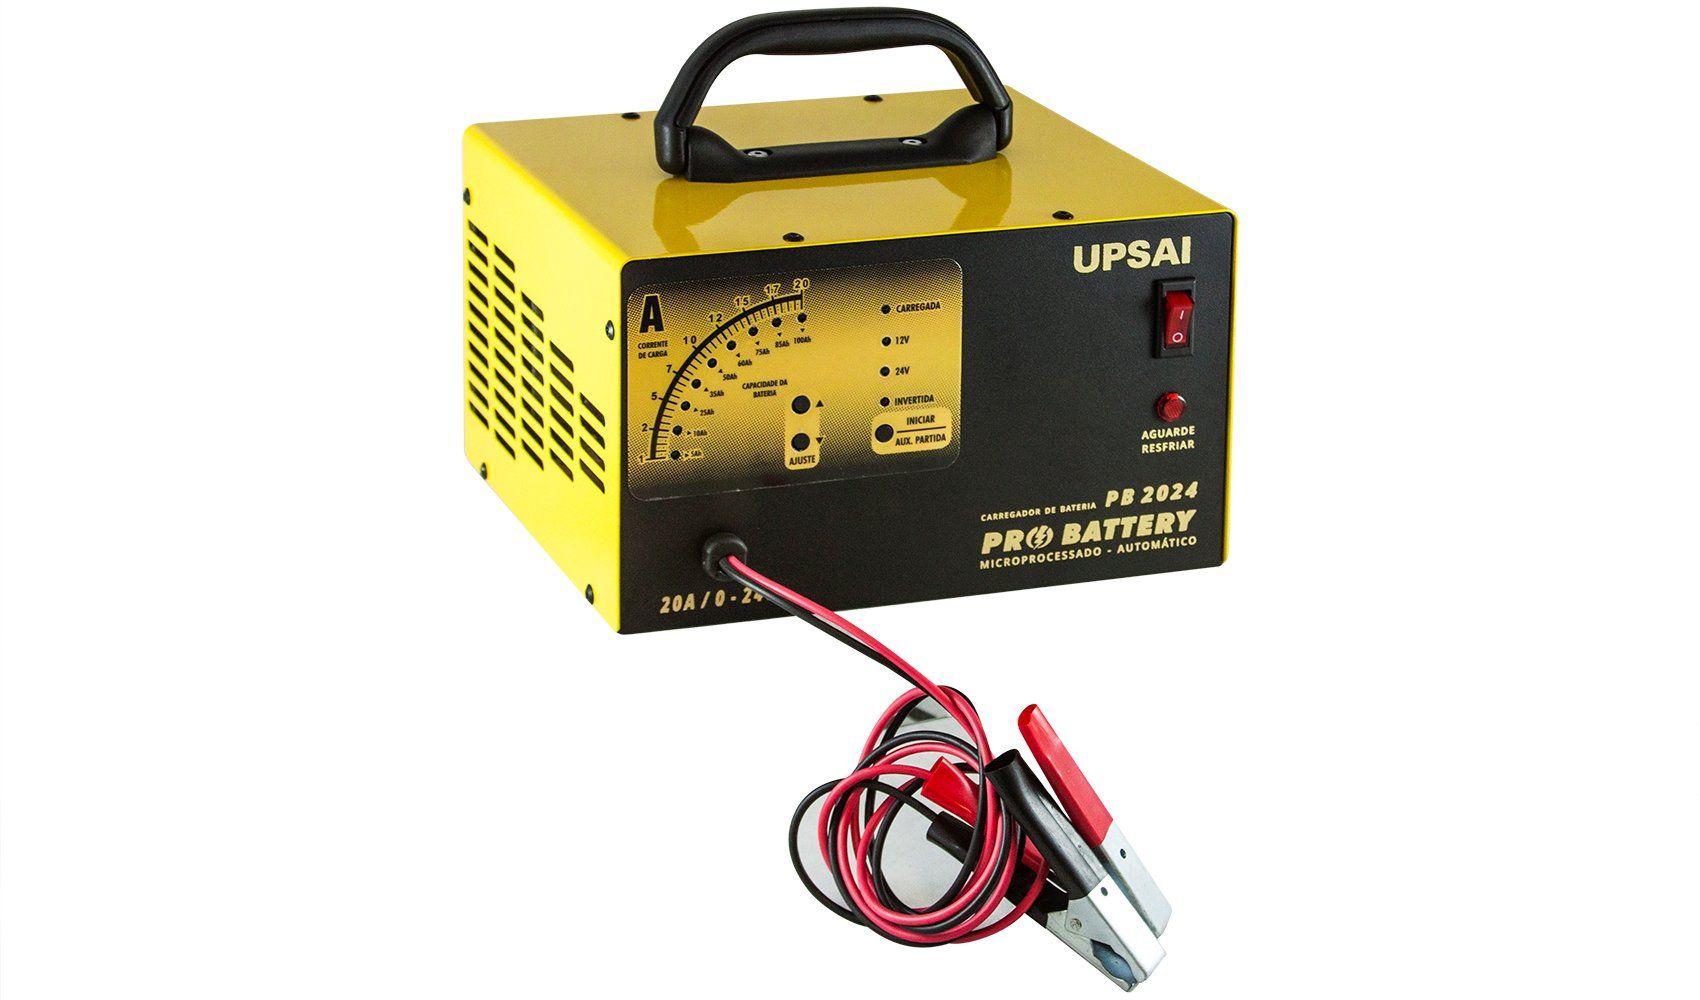 Carregador de Baterias 20A 0 a 24V Bivolt com Auxiliar de Partida - UPSAI-PB2024